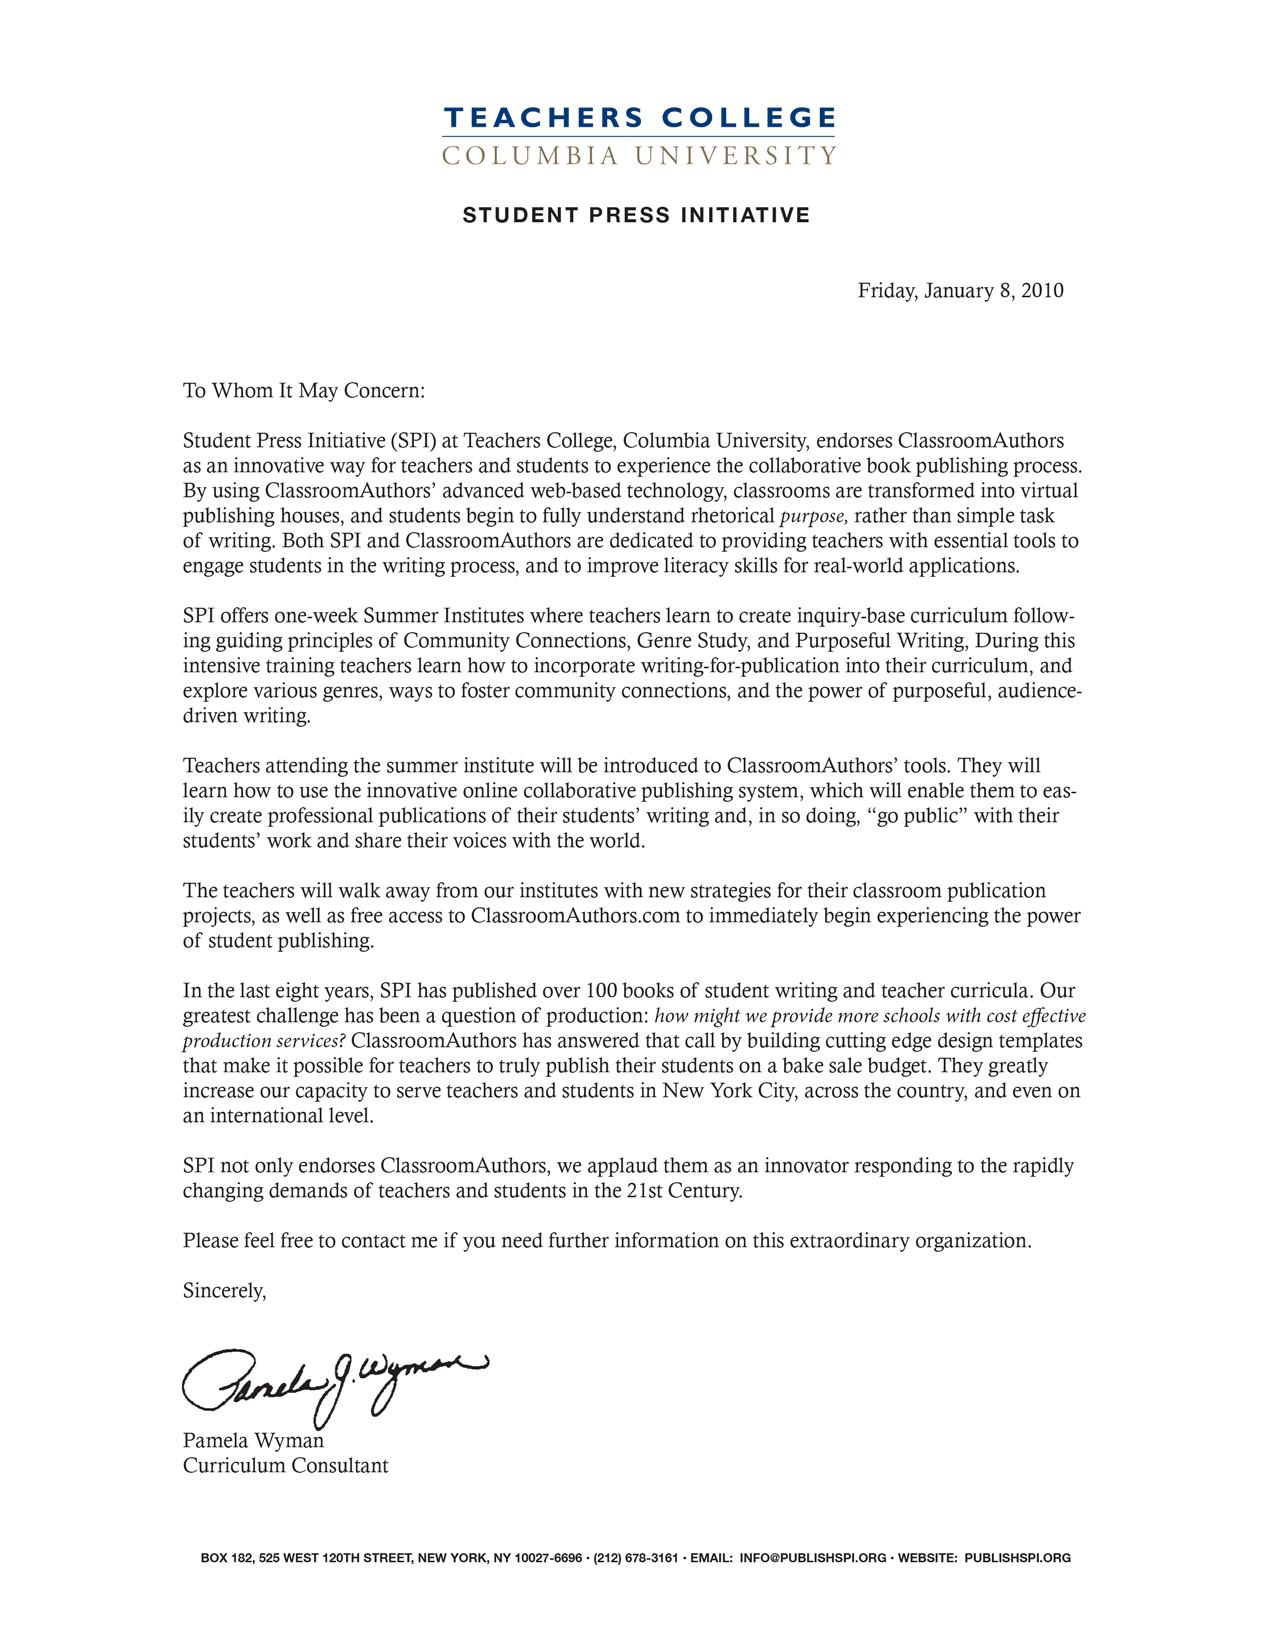 Teachers College Letter